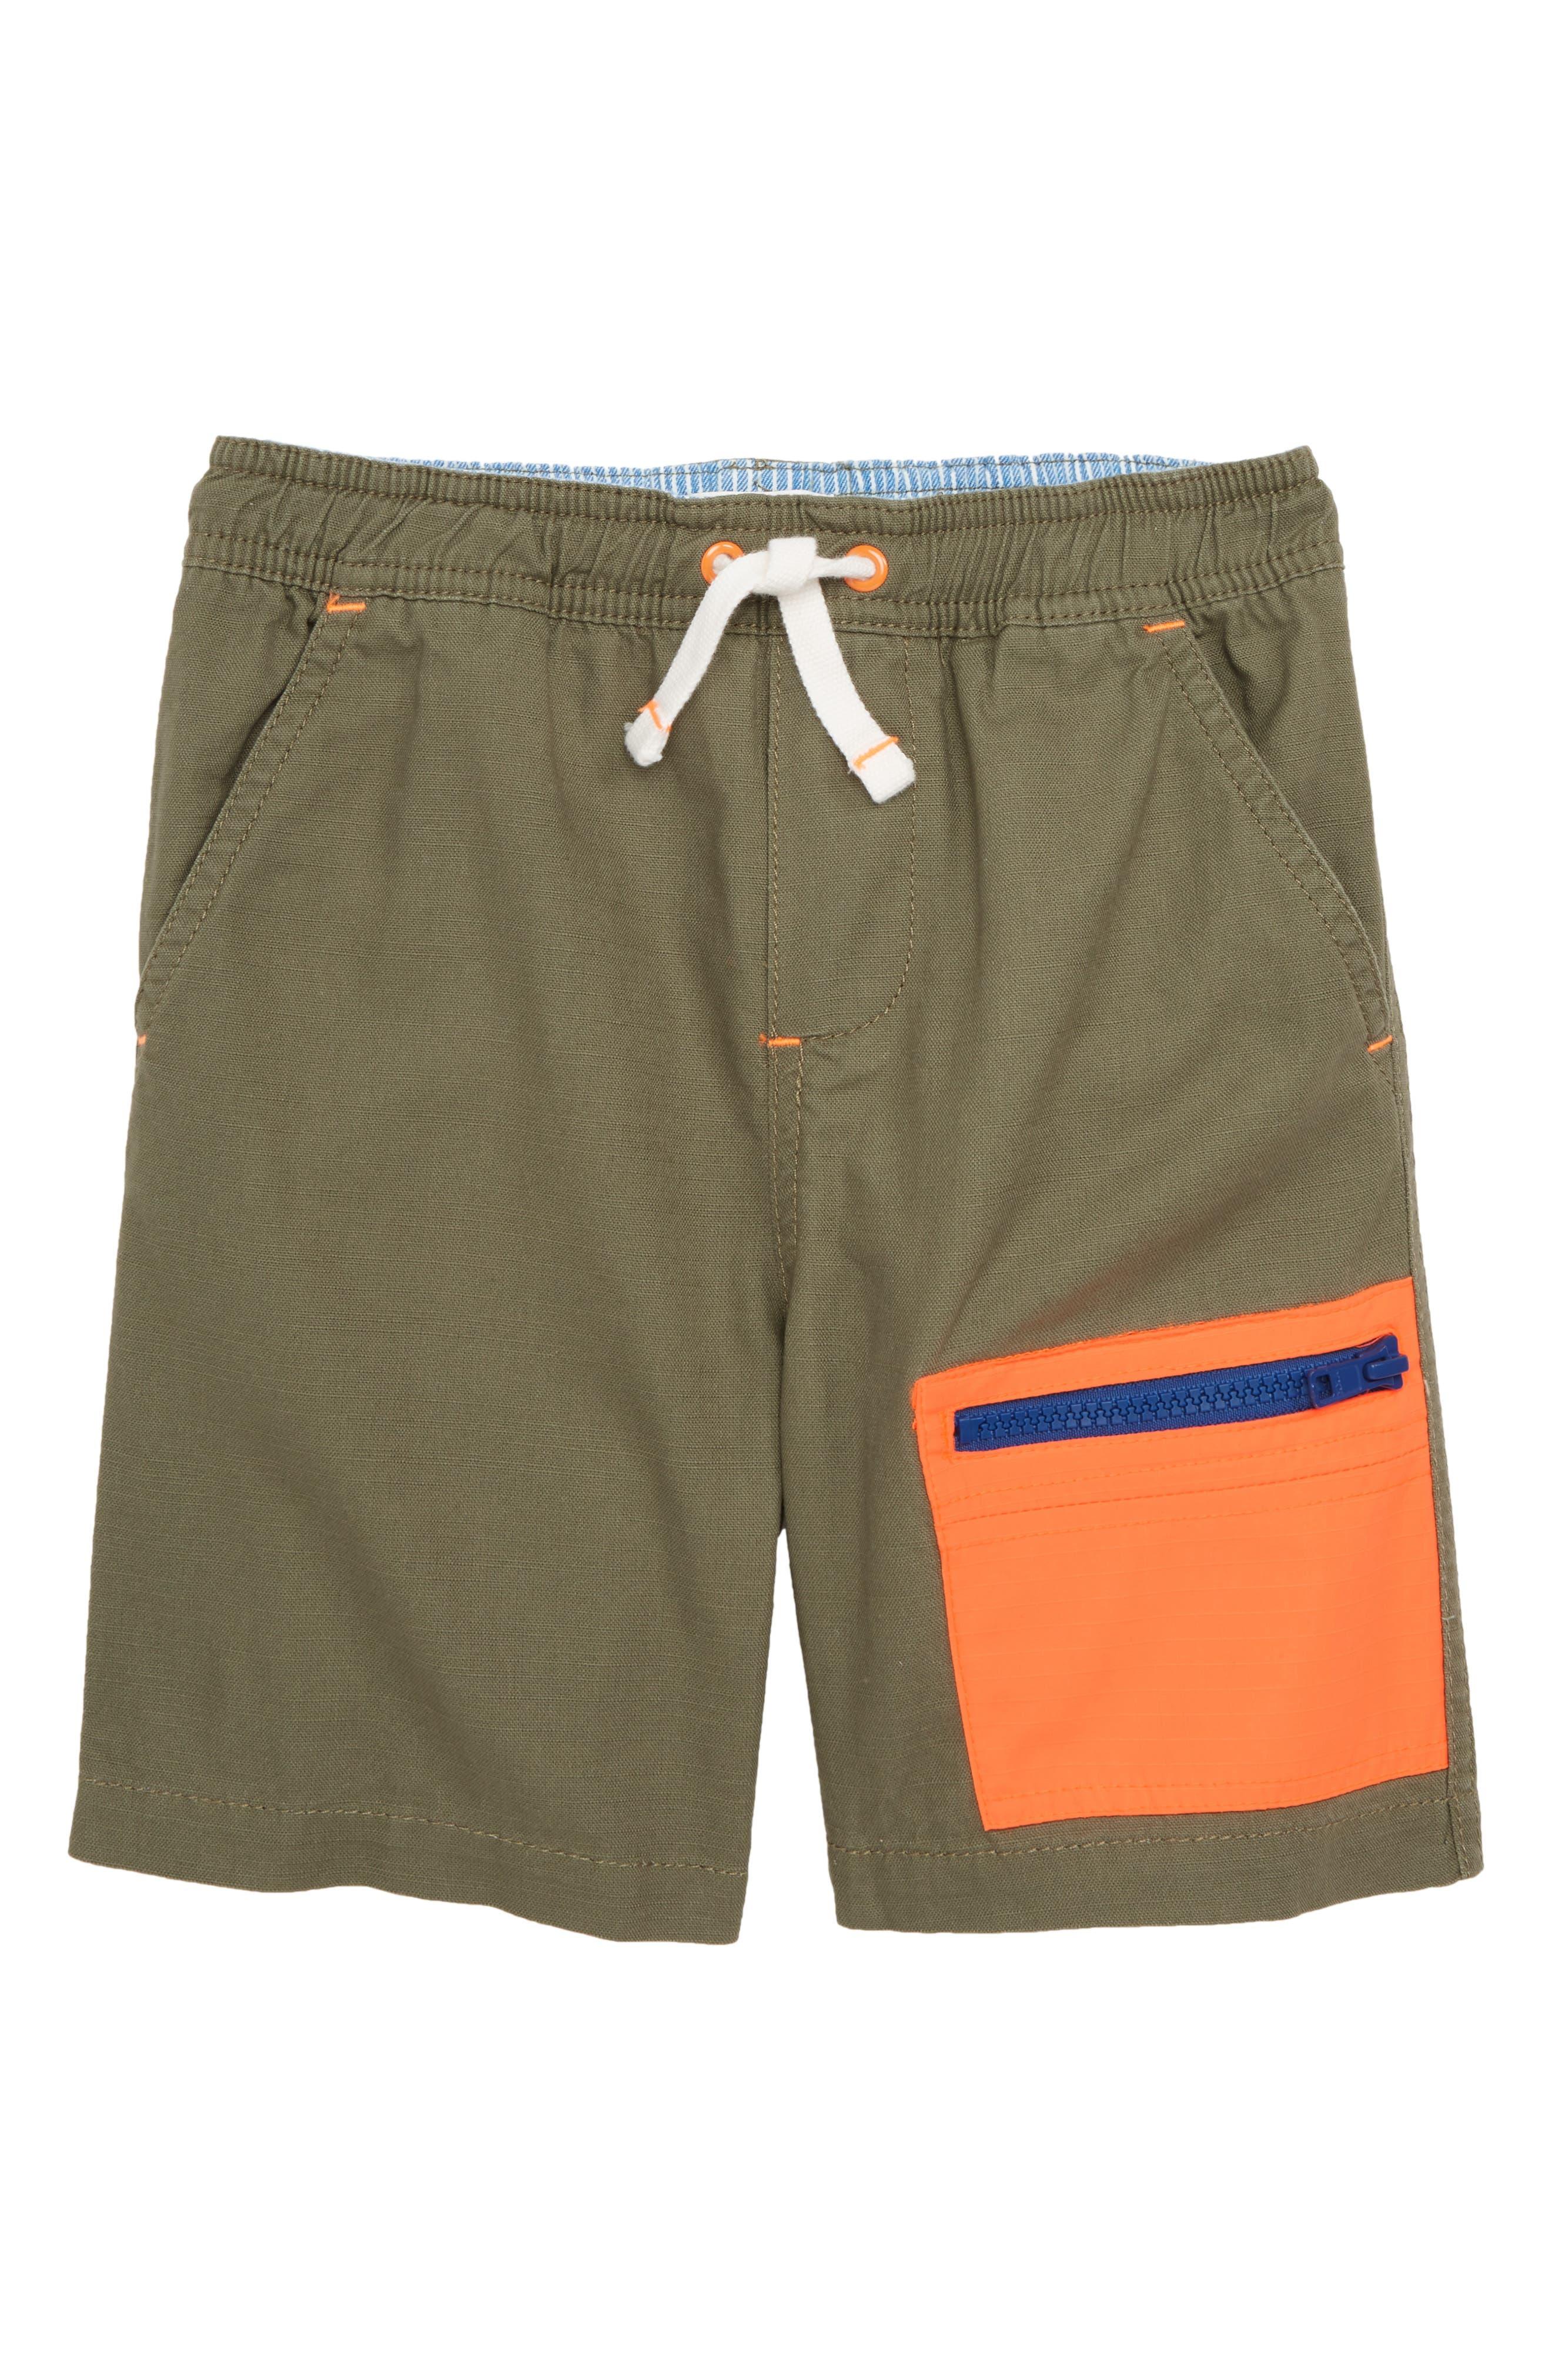 Colorblock Shorts,                             Main thumbnail 1, color,                             Khaki Green